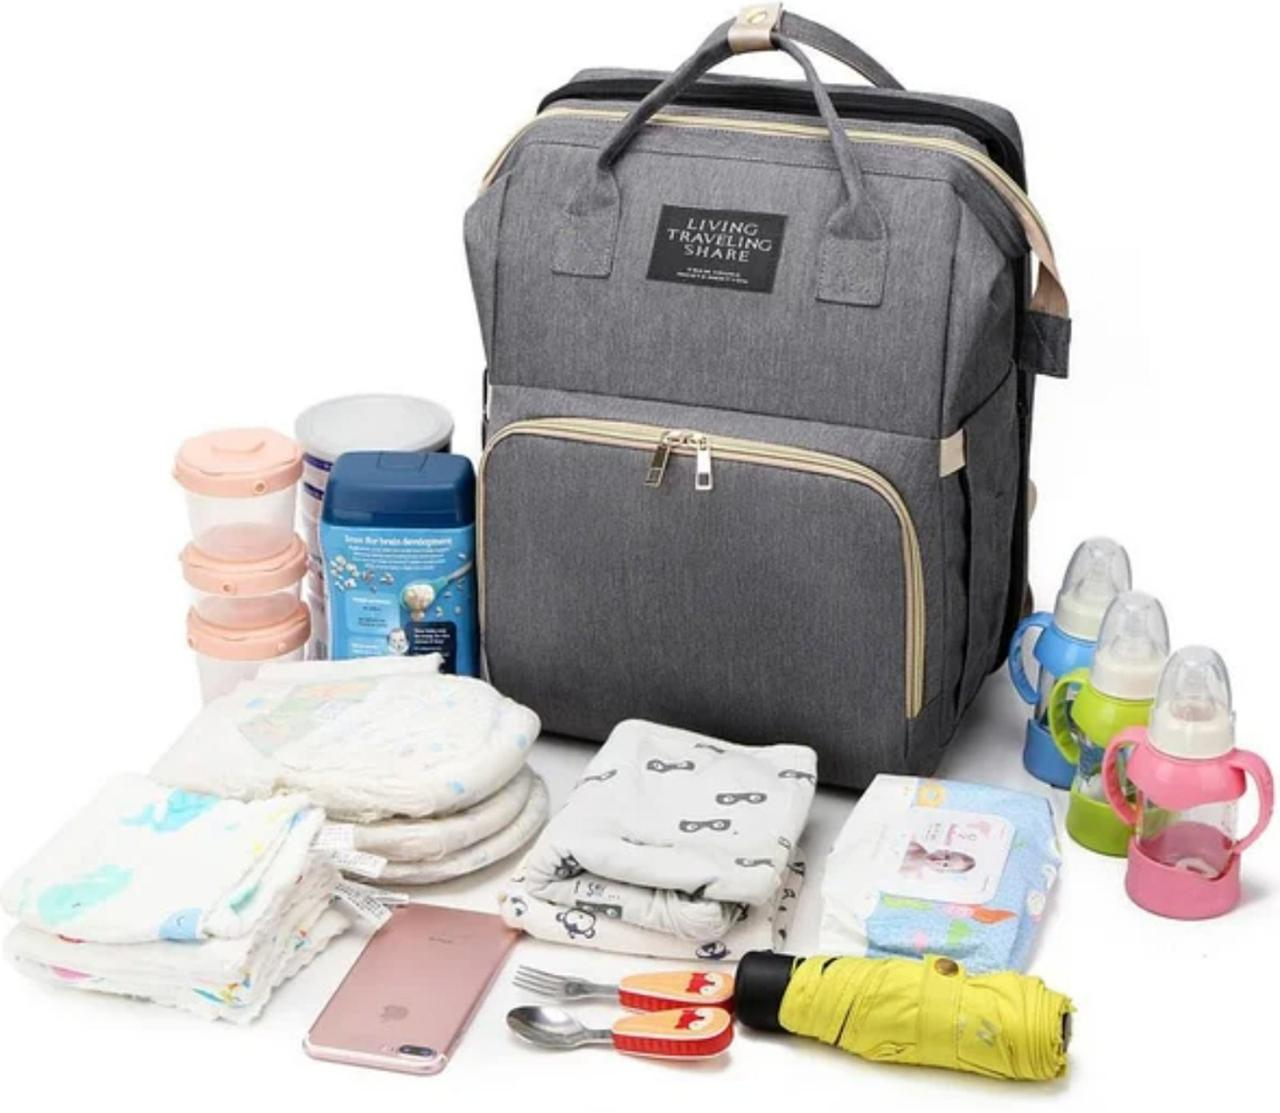 Рюкзак органайзер для мам Living Traveling Share c термокарманамі для пляшечок